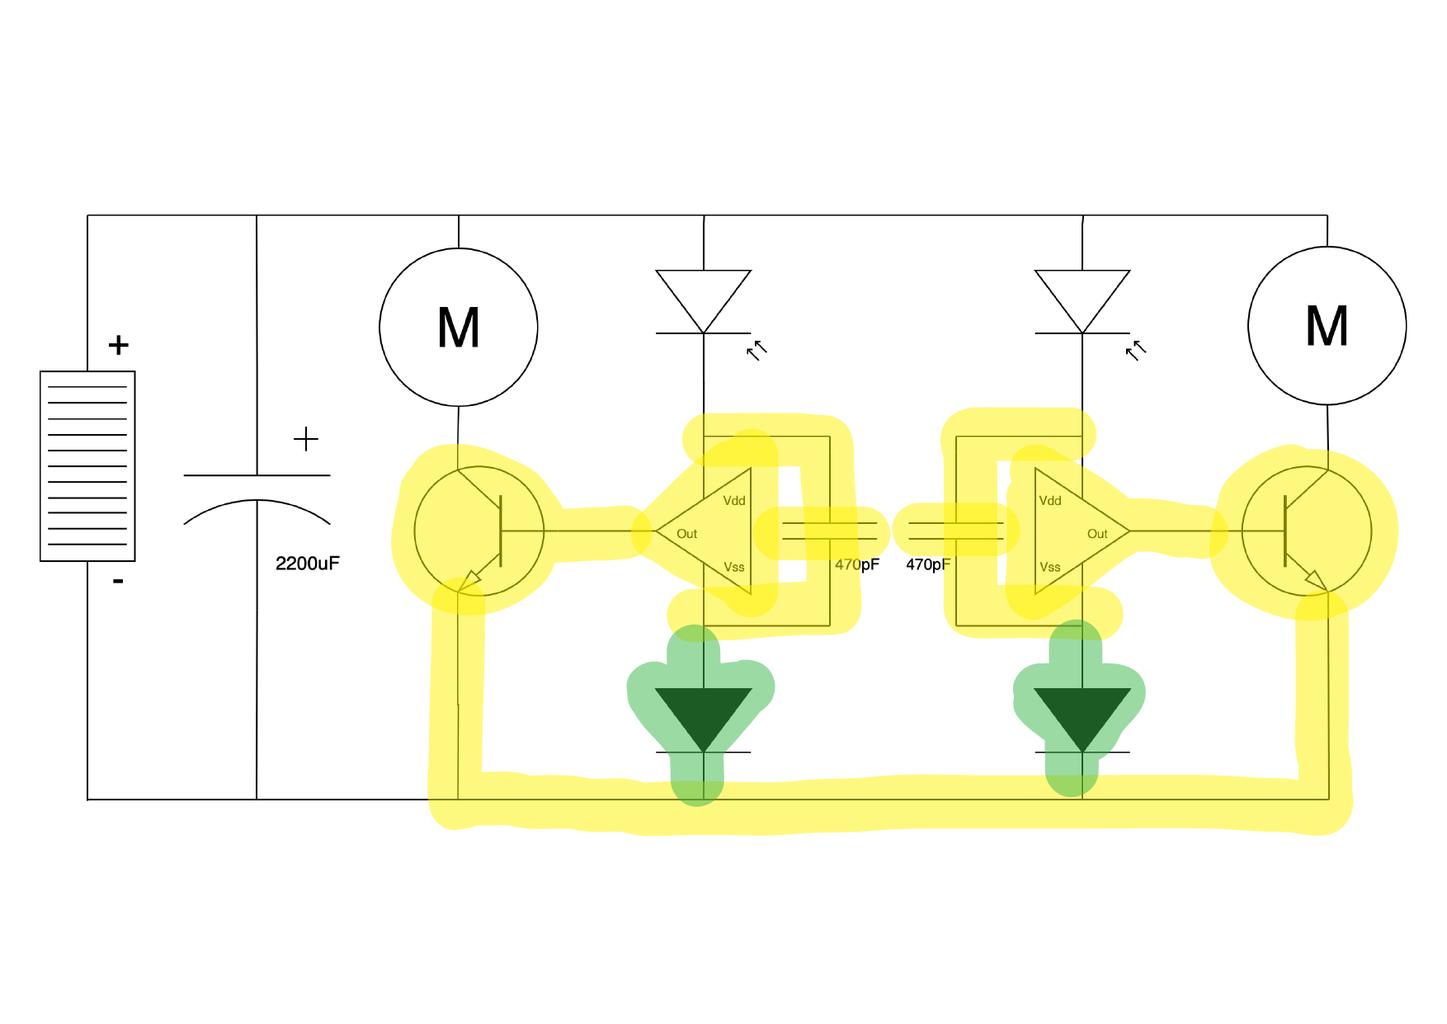 Freeforming the Circuit 7: BAV70